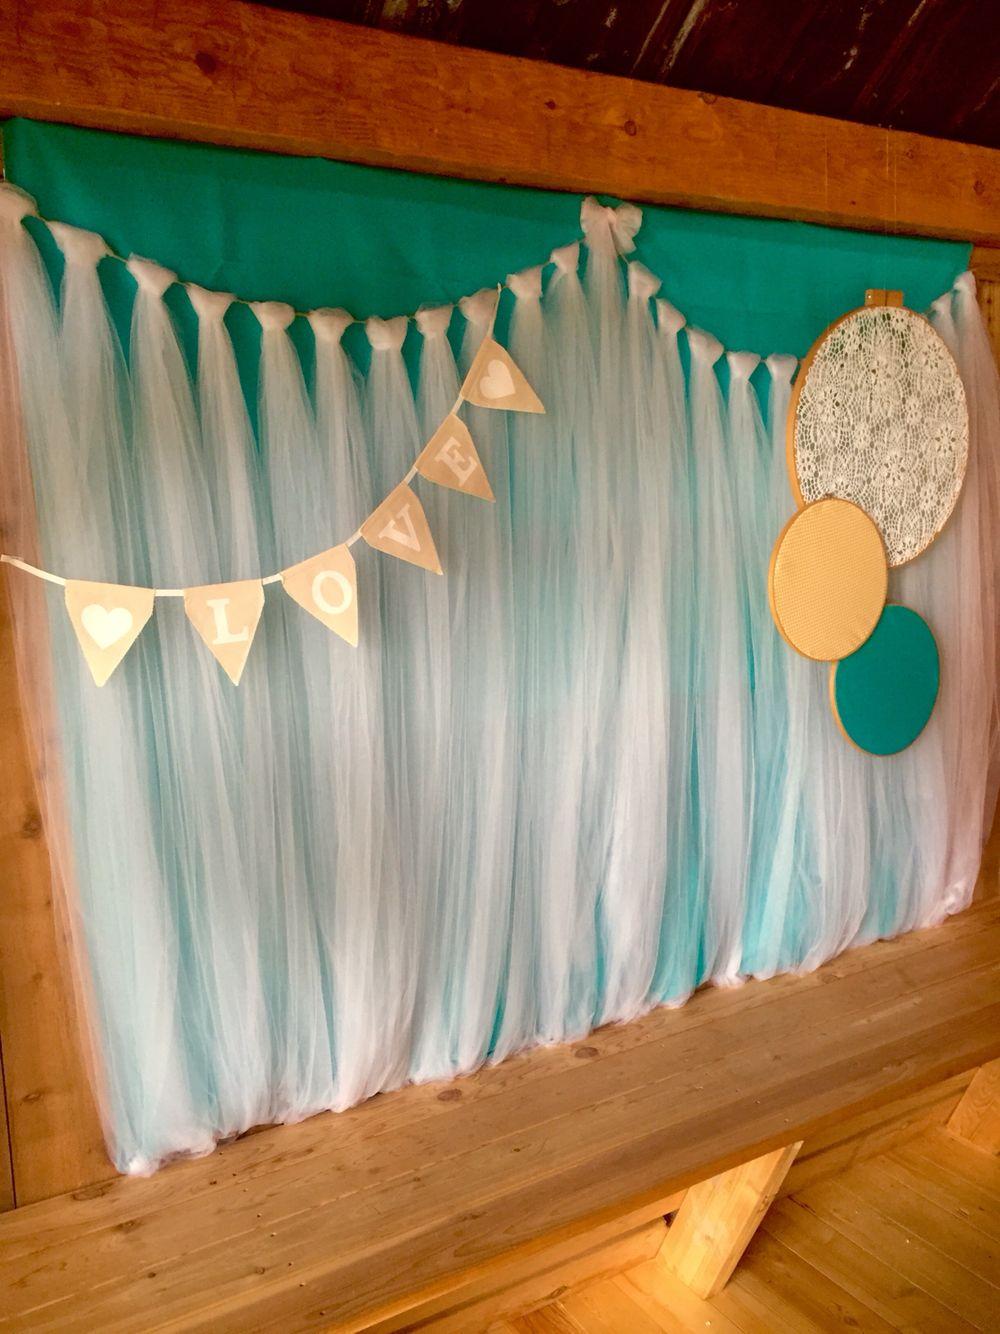 Diy Photobooth Backdrop Using A Fabric Teal Tablecloth